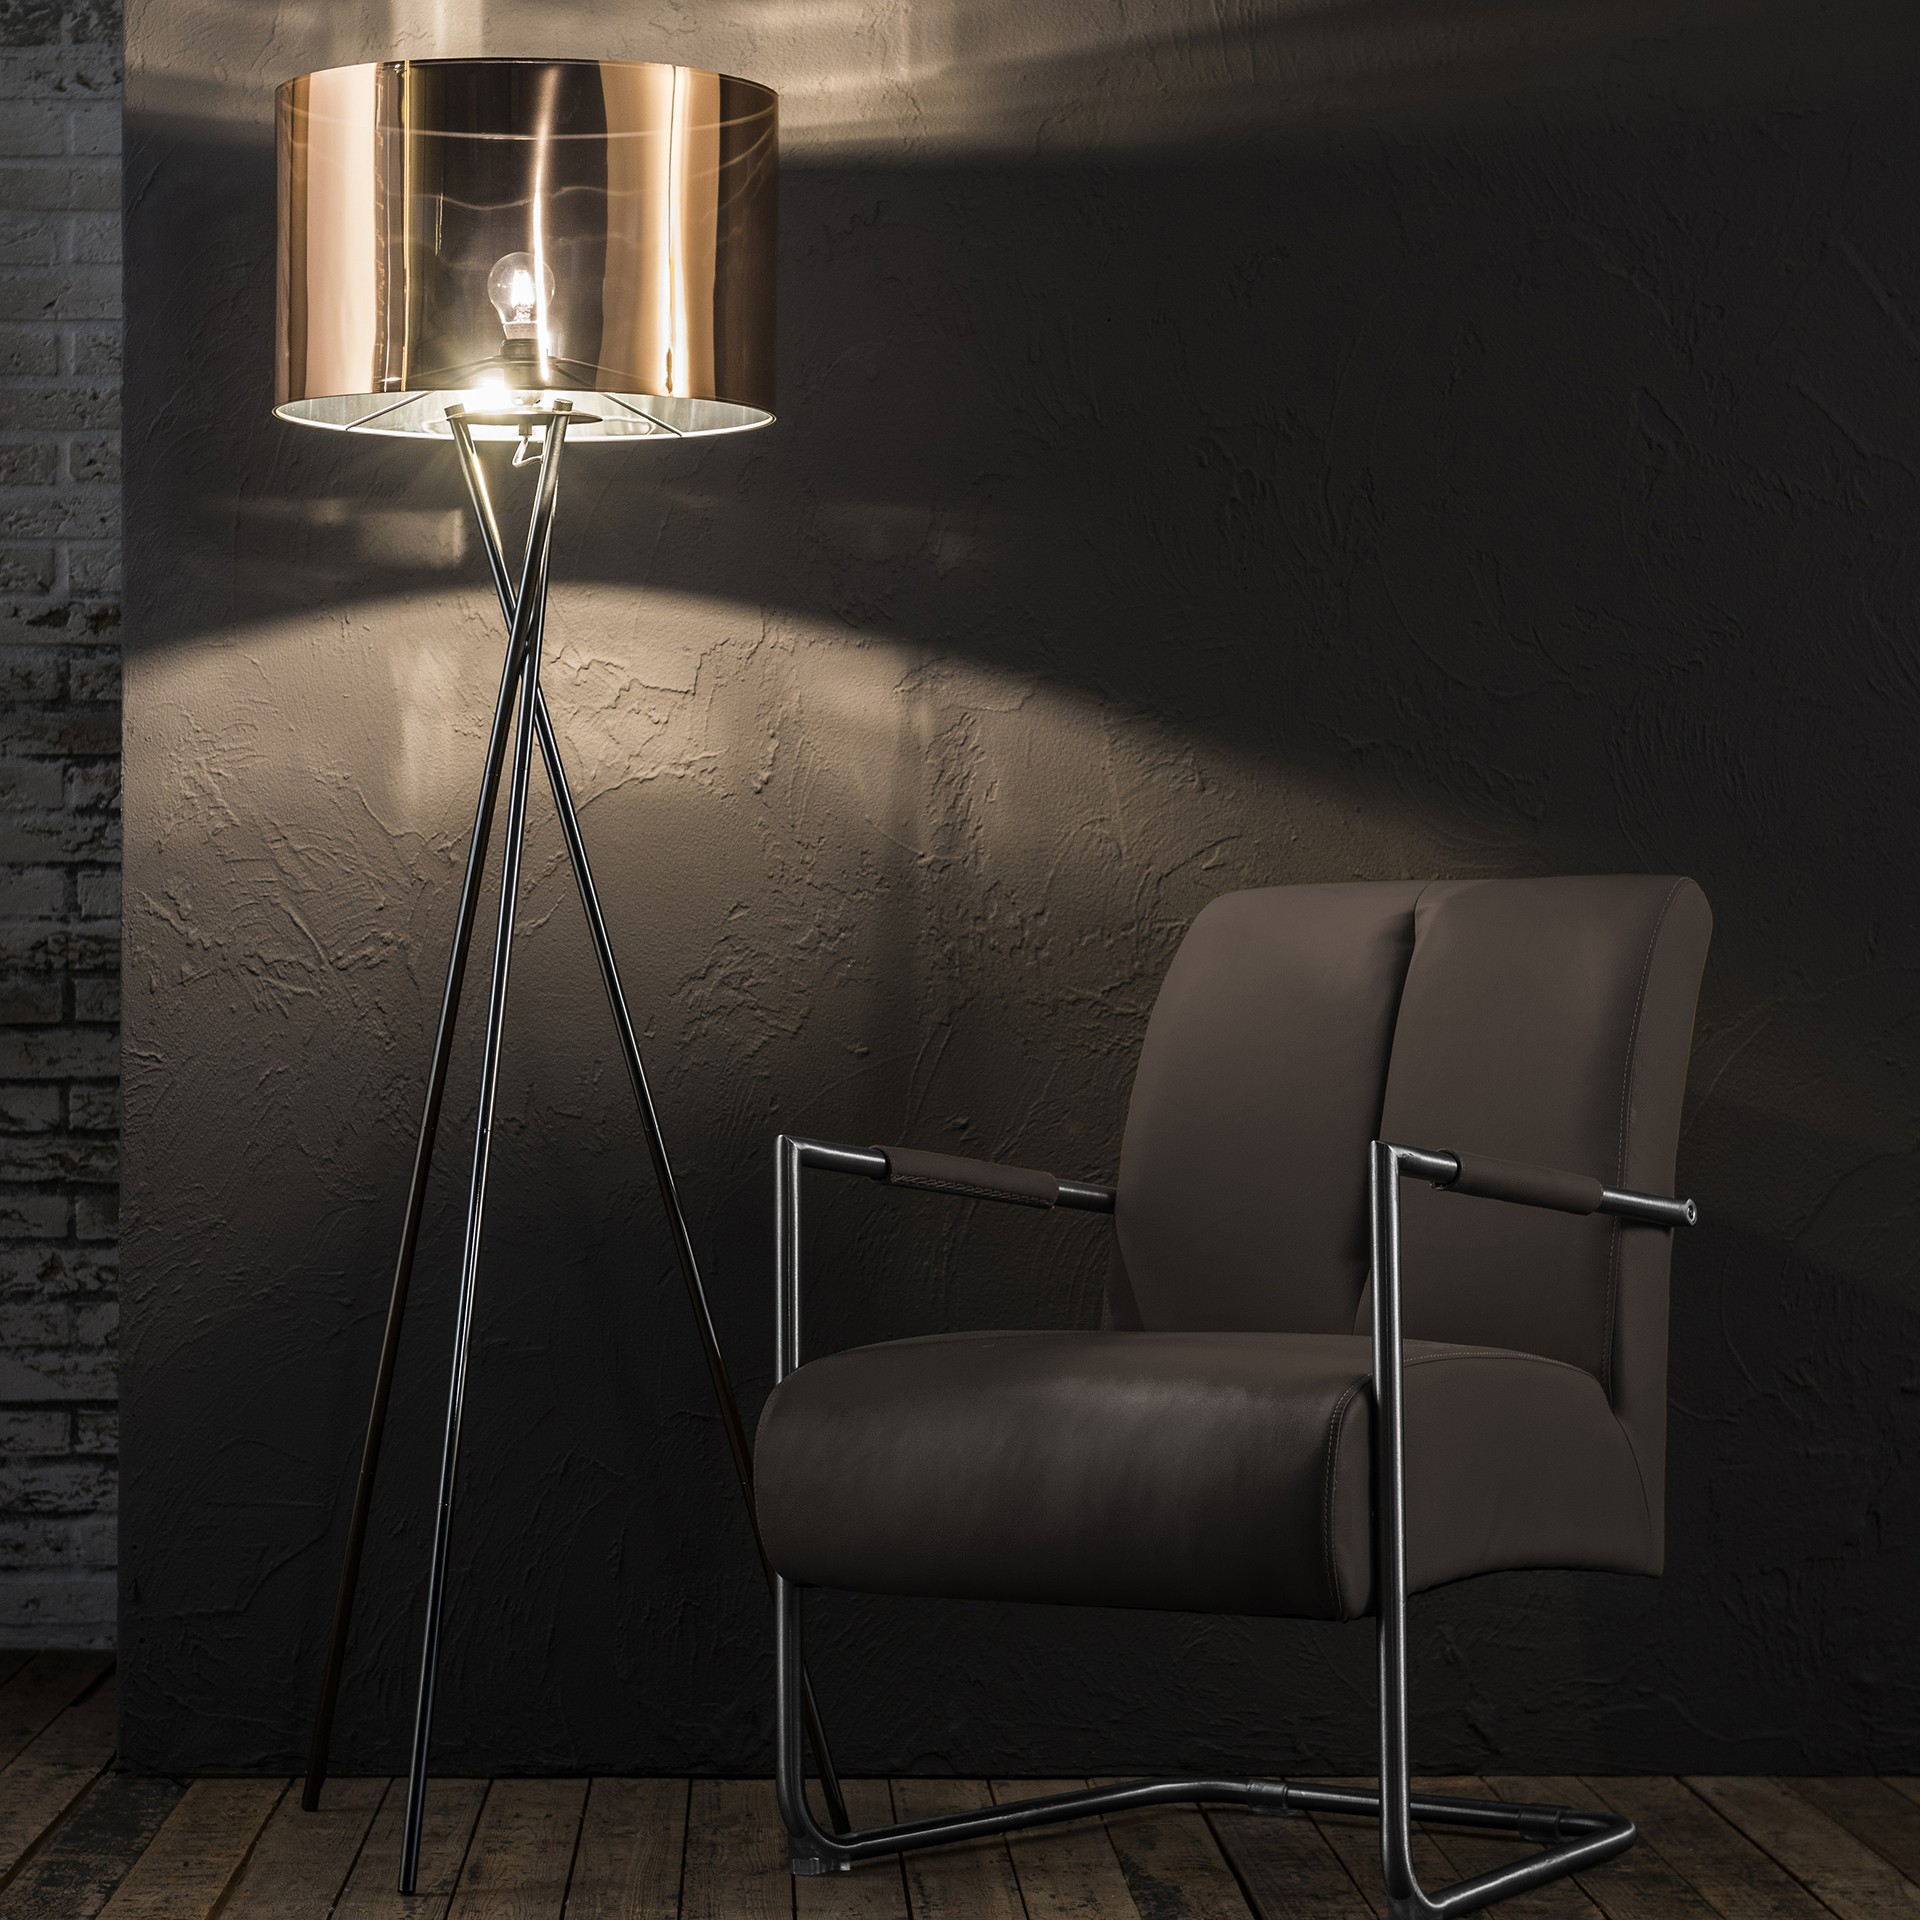 stehlampe silber kupfer stehleuchte mit lampenschirm h he 158 cm. Black Bedroom Furniture Sets. Home Design Ideas